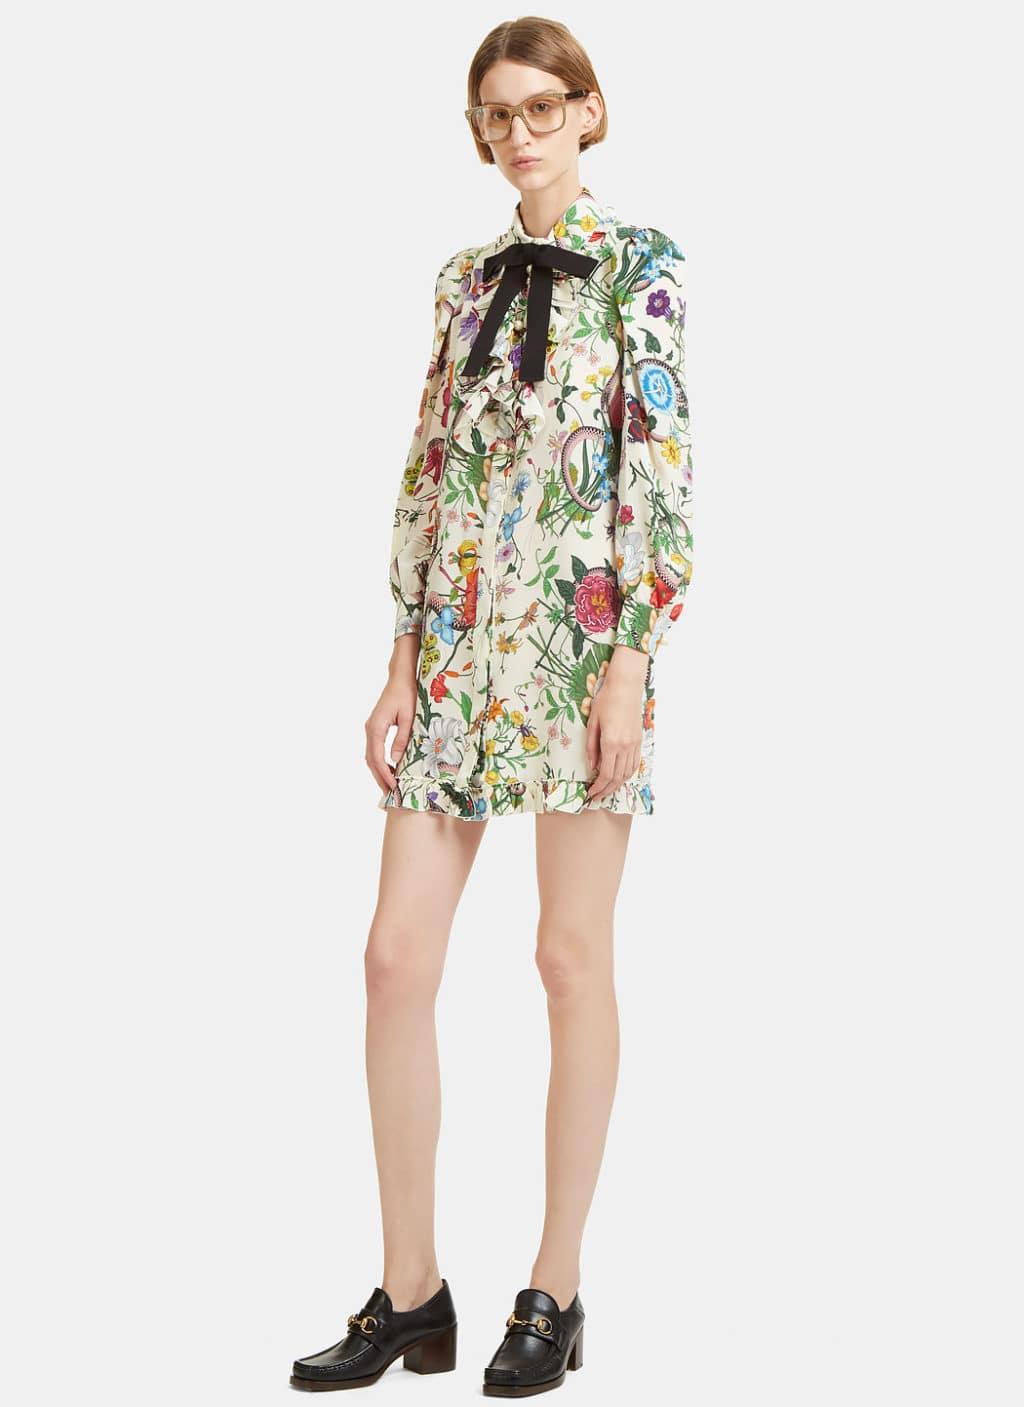 GUCCI Flora Snake Print Ruffled Shirt Cream Dress - We Select Dresses